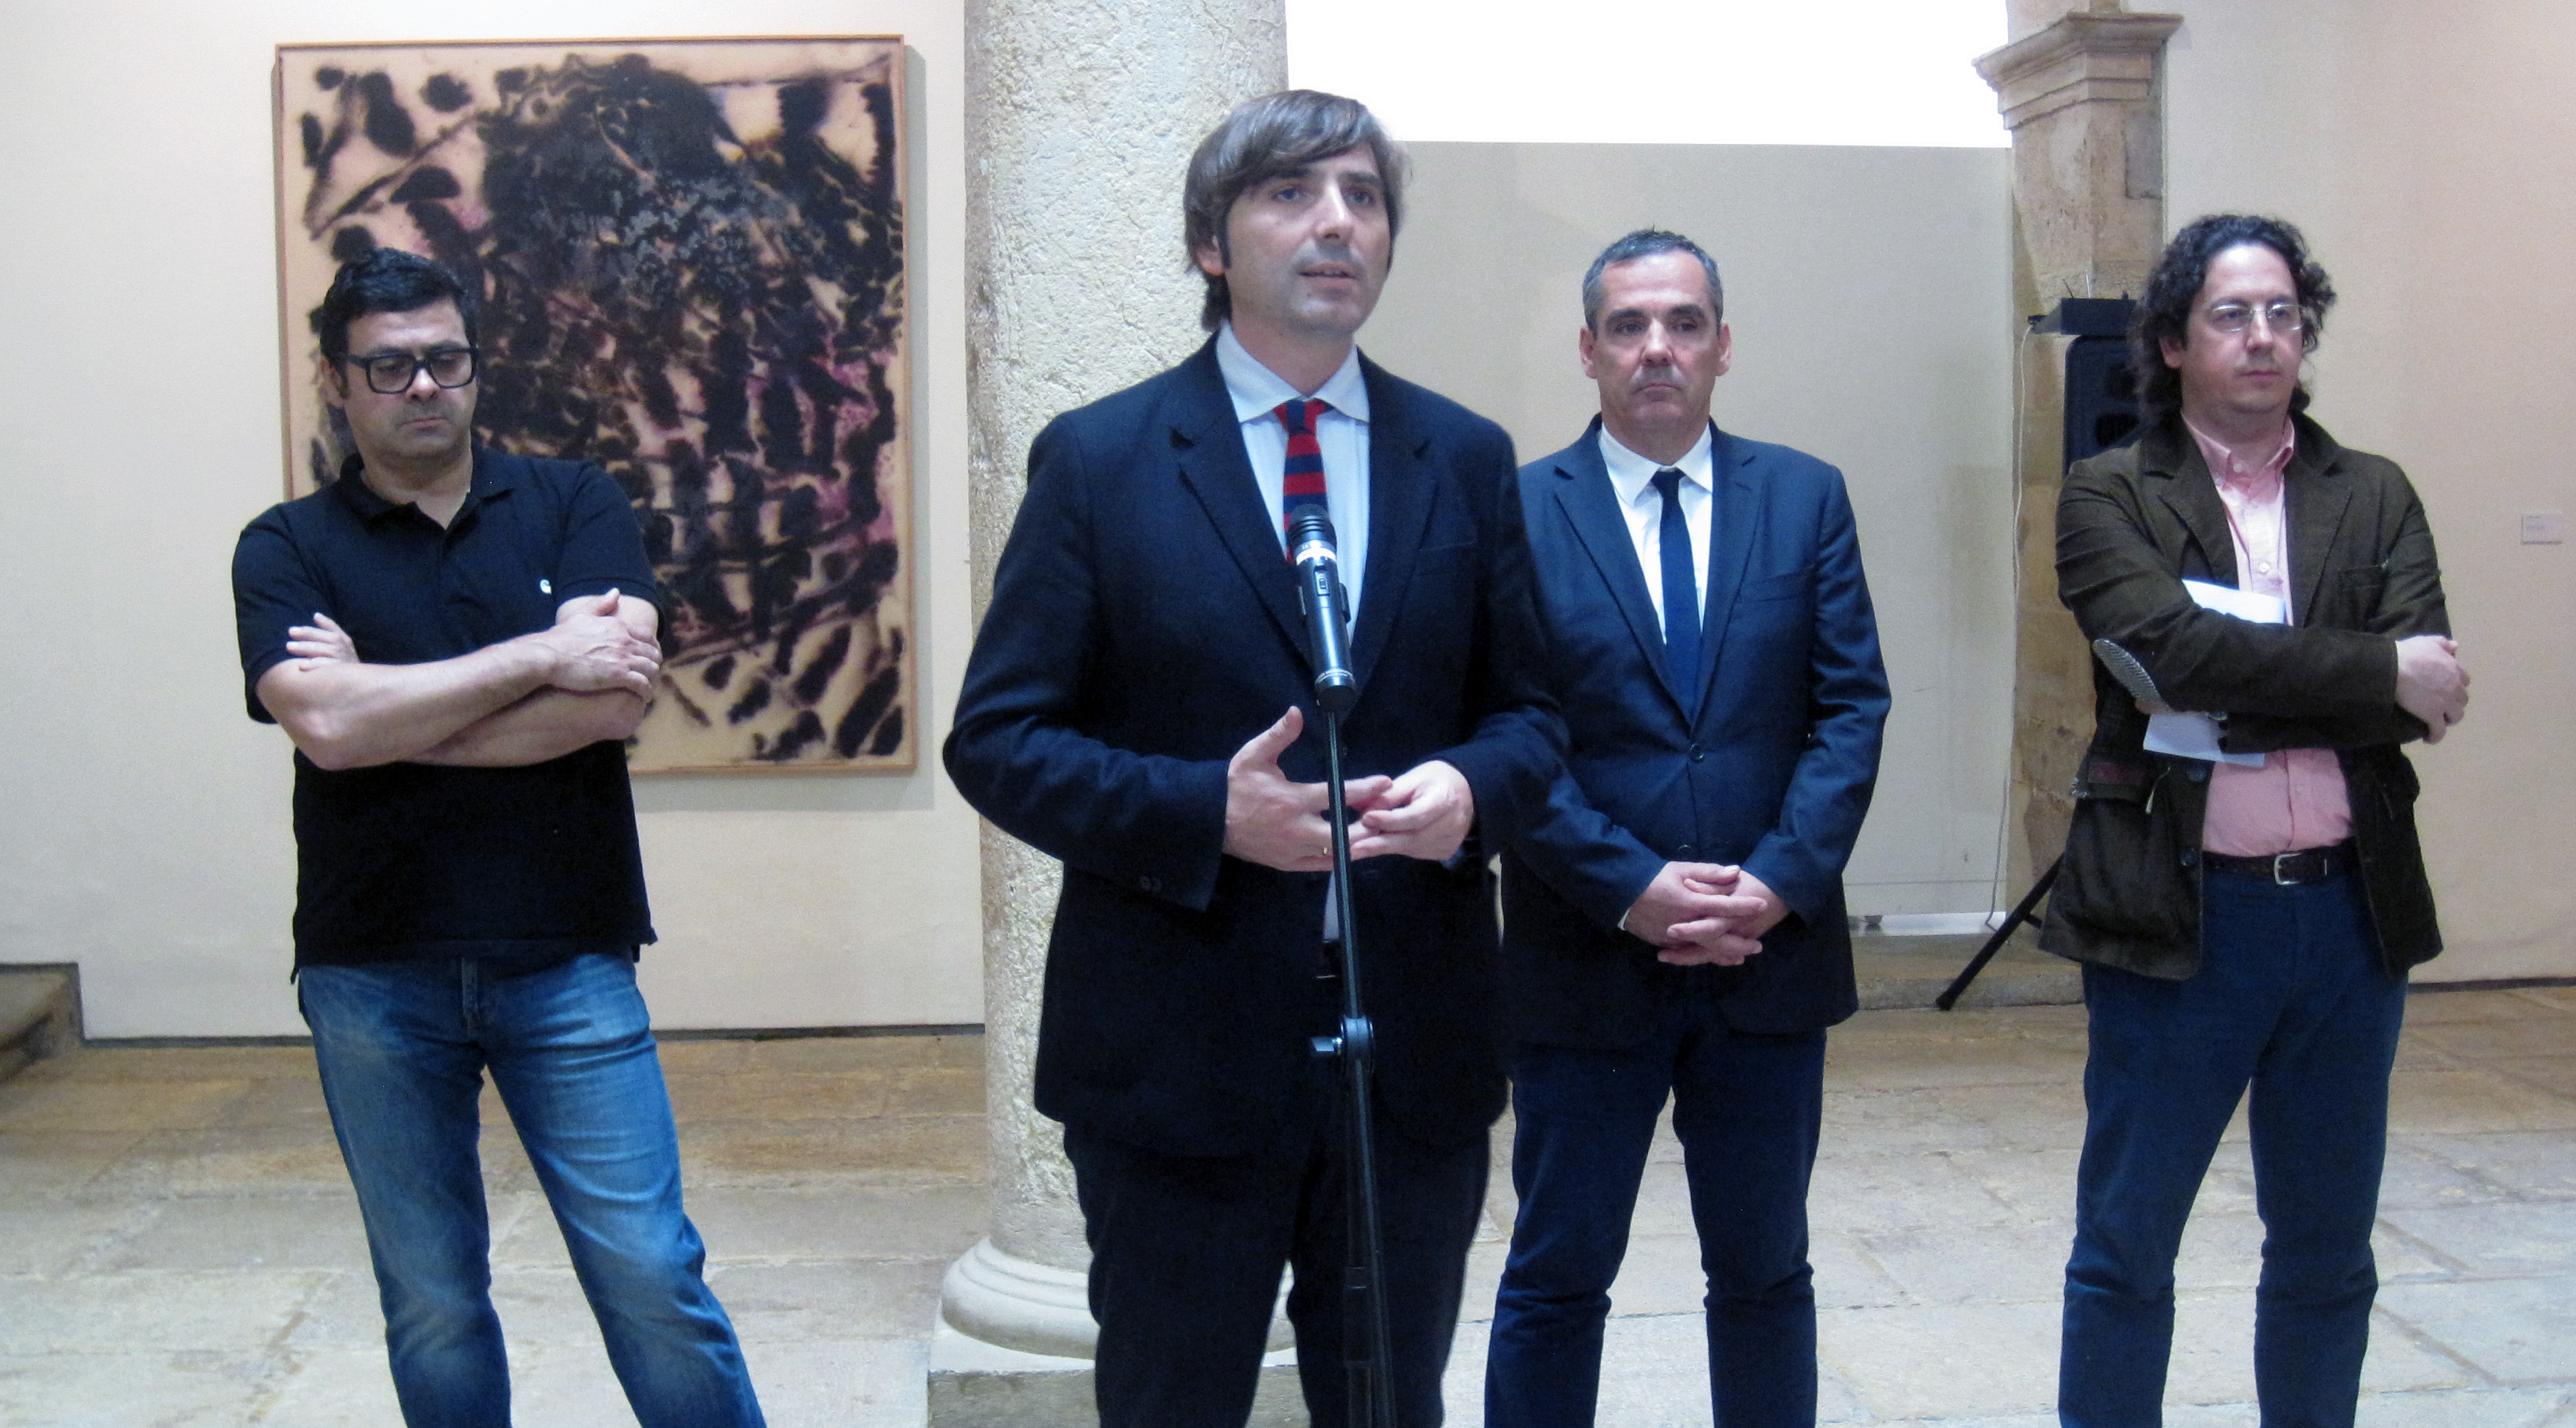 Presentación-exposición de dos obras de Carlos Coronas